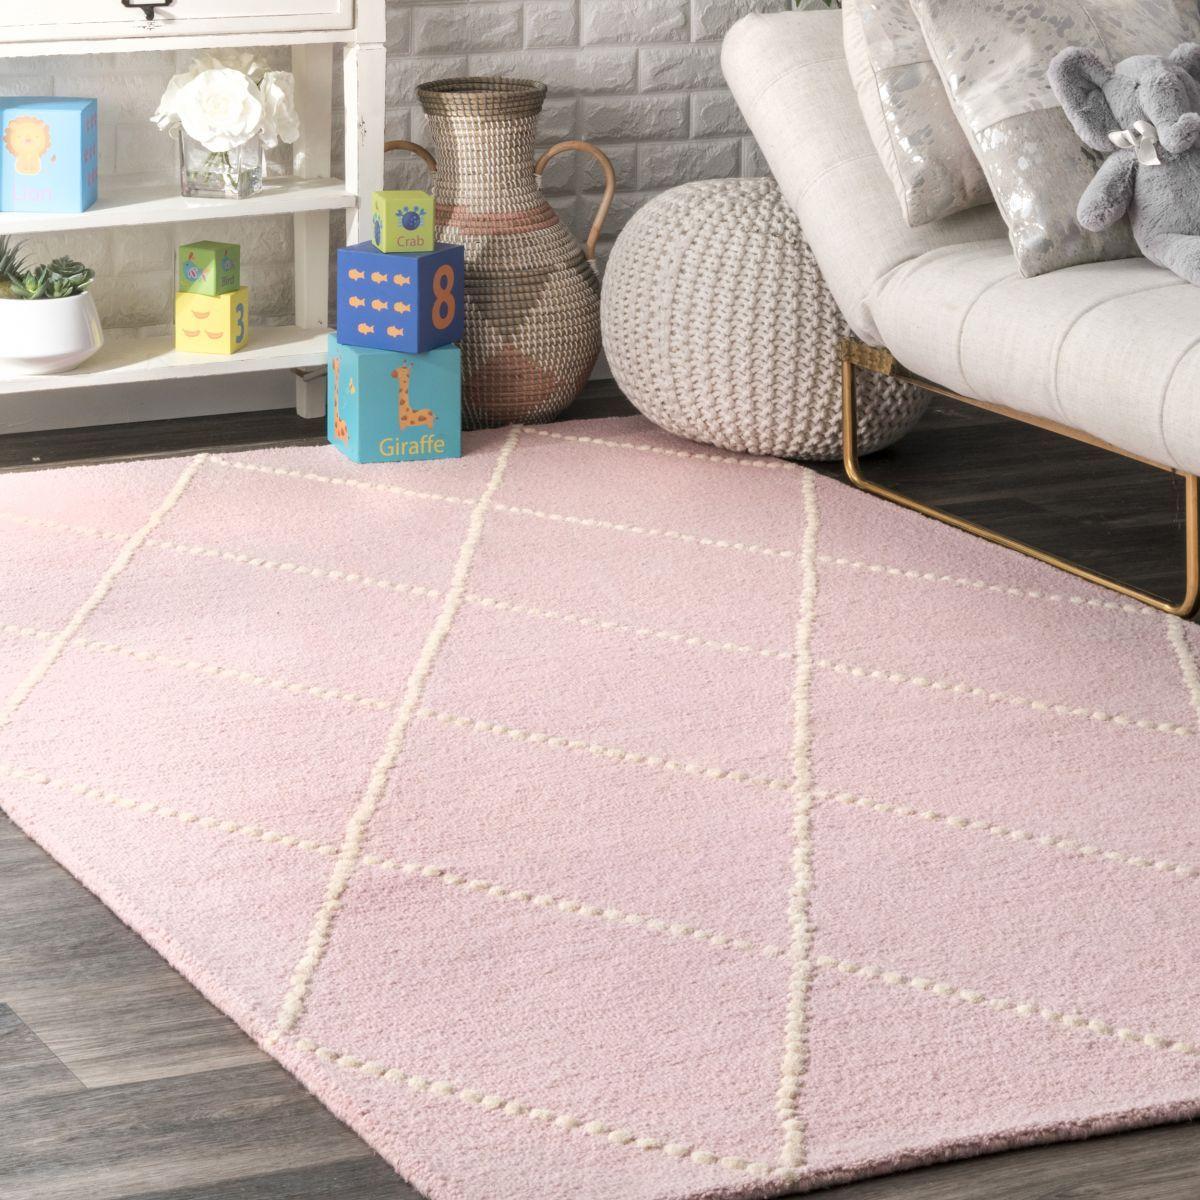 Tuscan Dotted Diamond Trellis Nursery Baby Pink Rug in